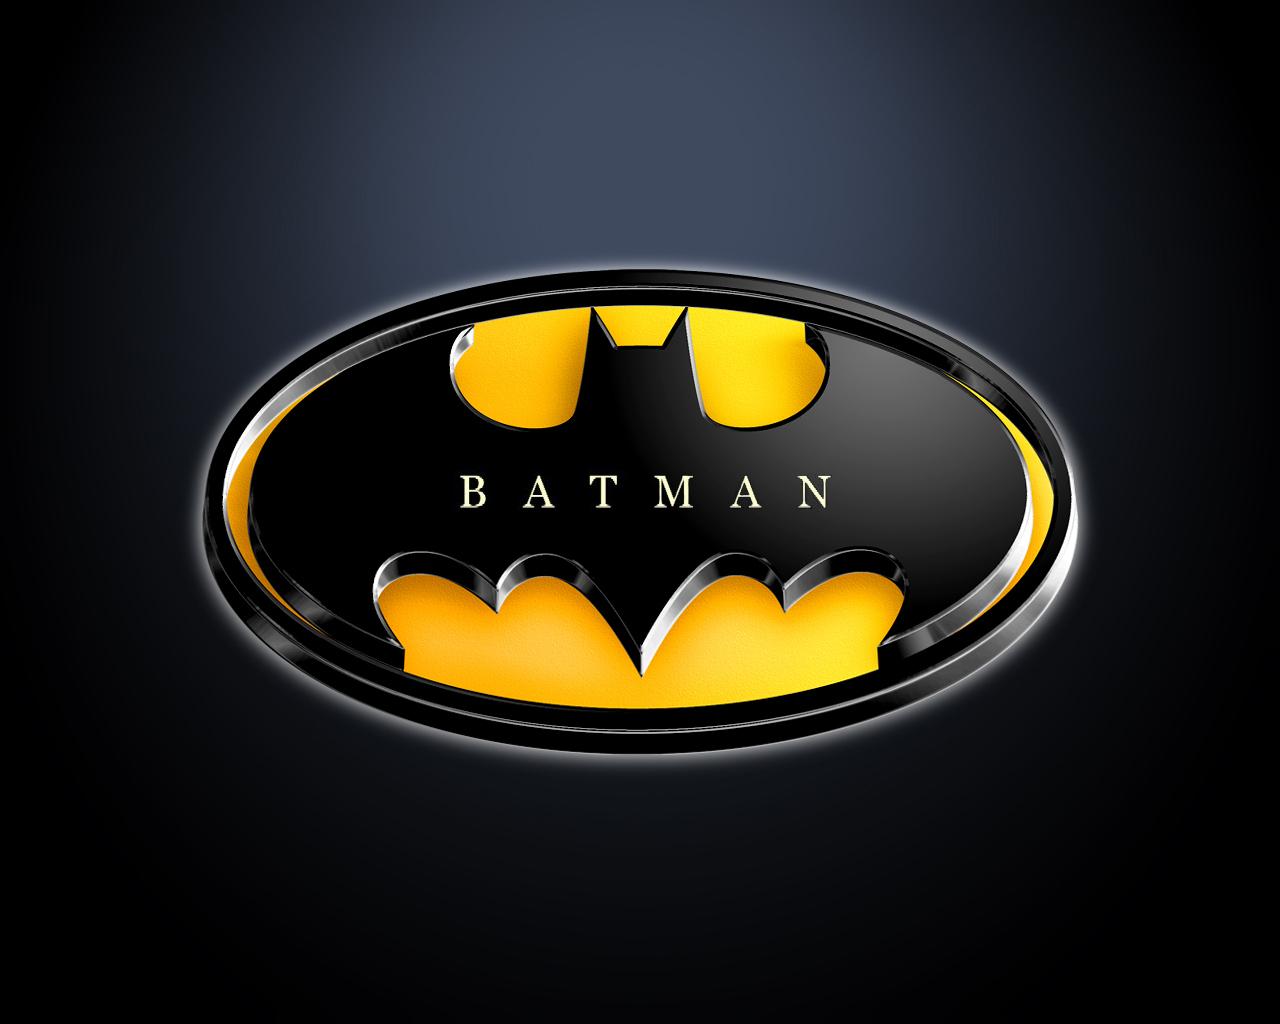 http://4.bp.blogspot.com/-nVUOYF-M7BQ/UA6JoCUT5hI/AAAAAAAAGy0/OjsdASTPNdw/s1600/Batman-Logo.jpg